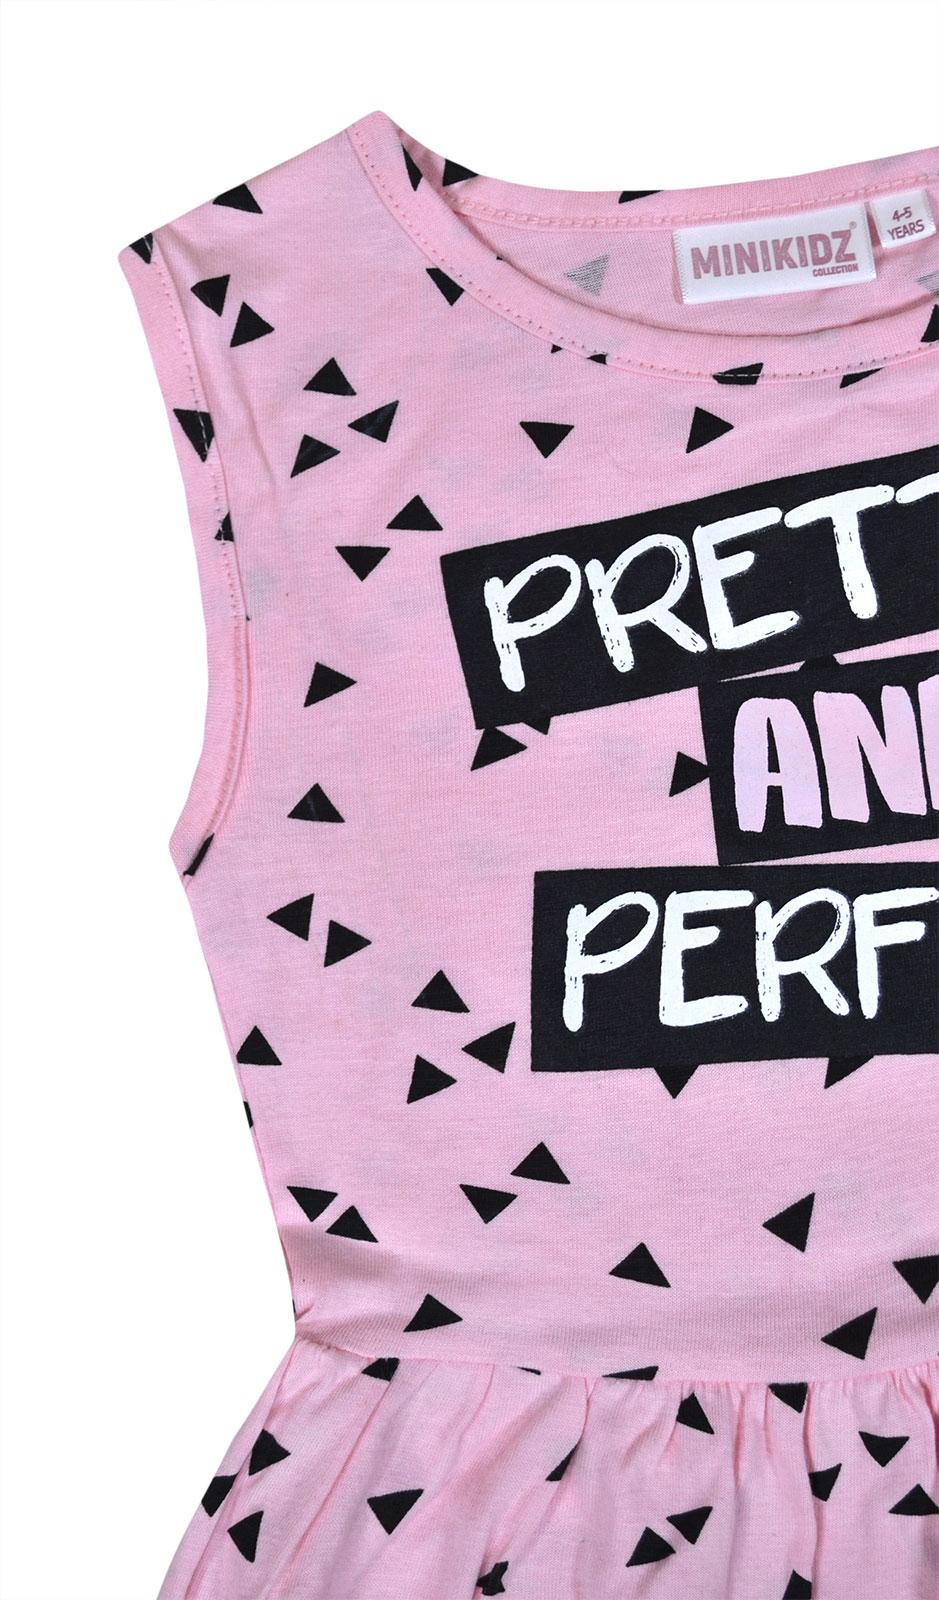 Girls-Summer-Dress-Kids-New-Skater-Dress-Cotton-Pink-Black-Age-2-3-4-5-6-7-8-Yrs thumbnail 4